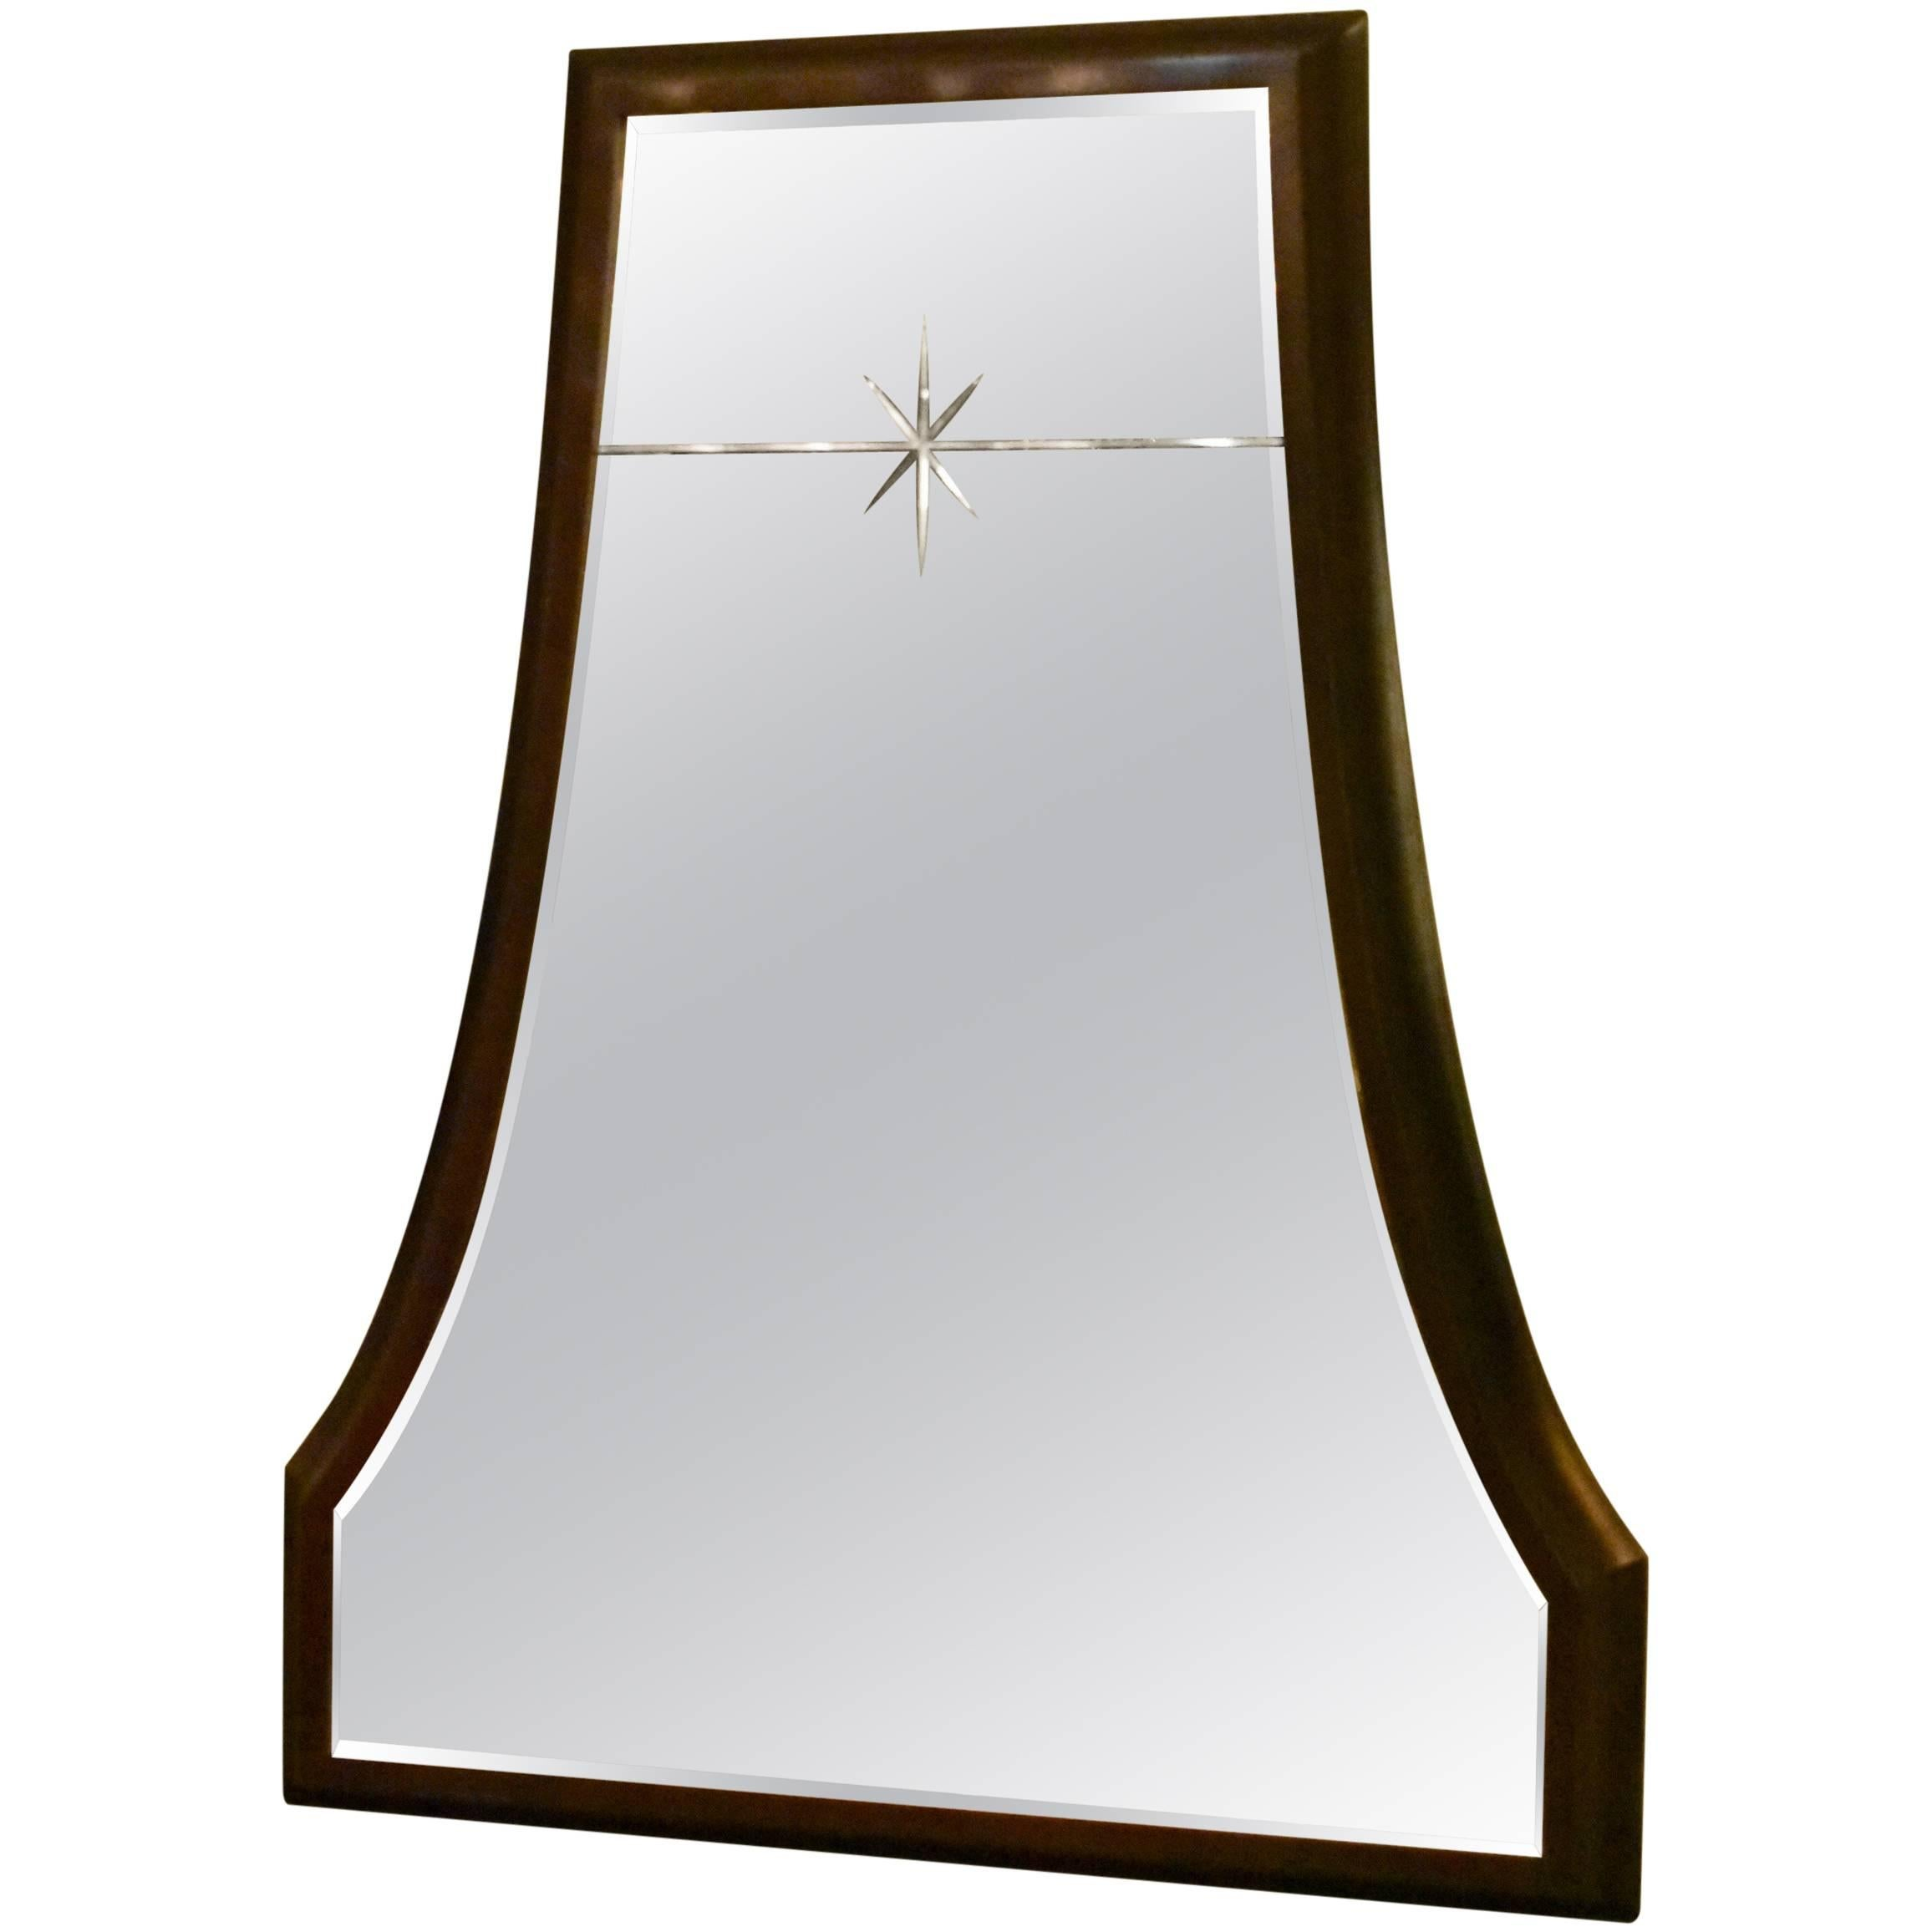 Modern U0026quot;Grand Starlightu0026quot; Mirror By Barbara Barry For Henredon  Furniture